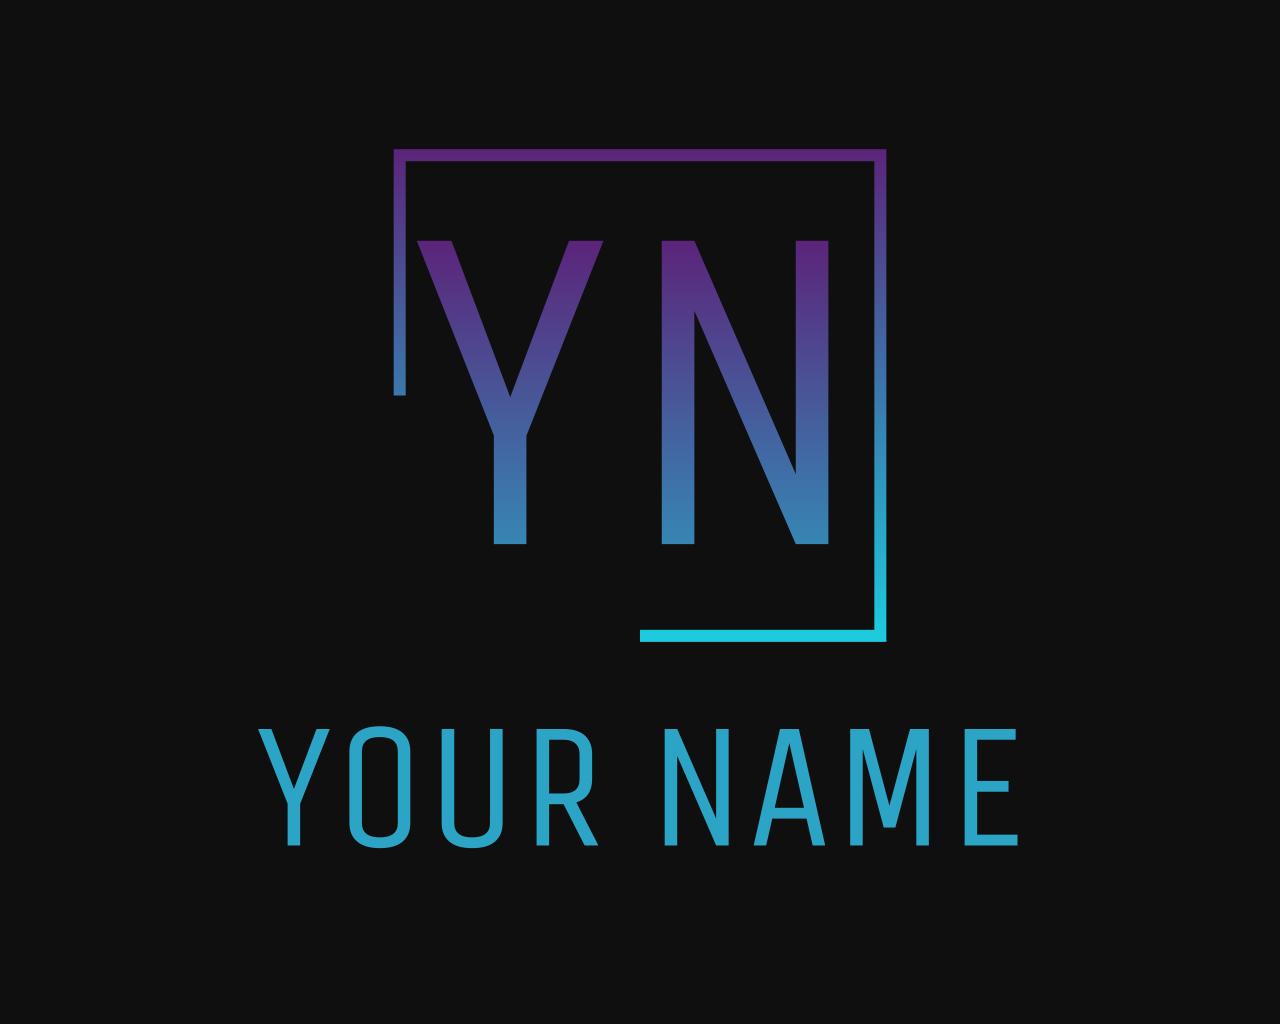 I Will Design Square Letter Logo